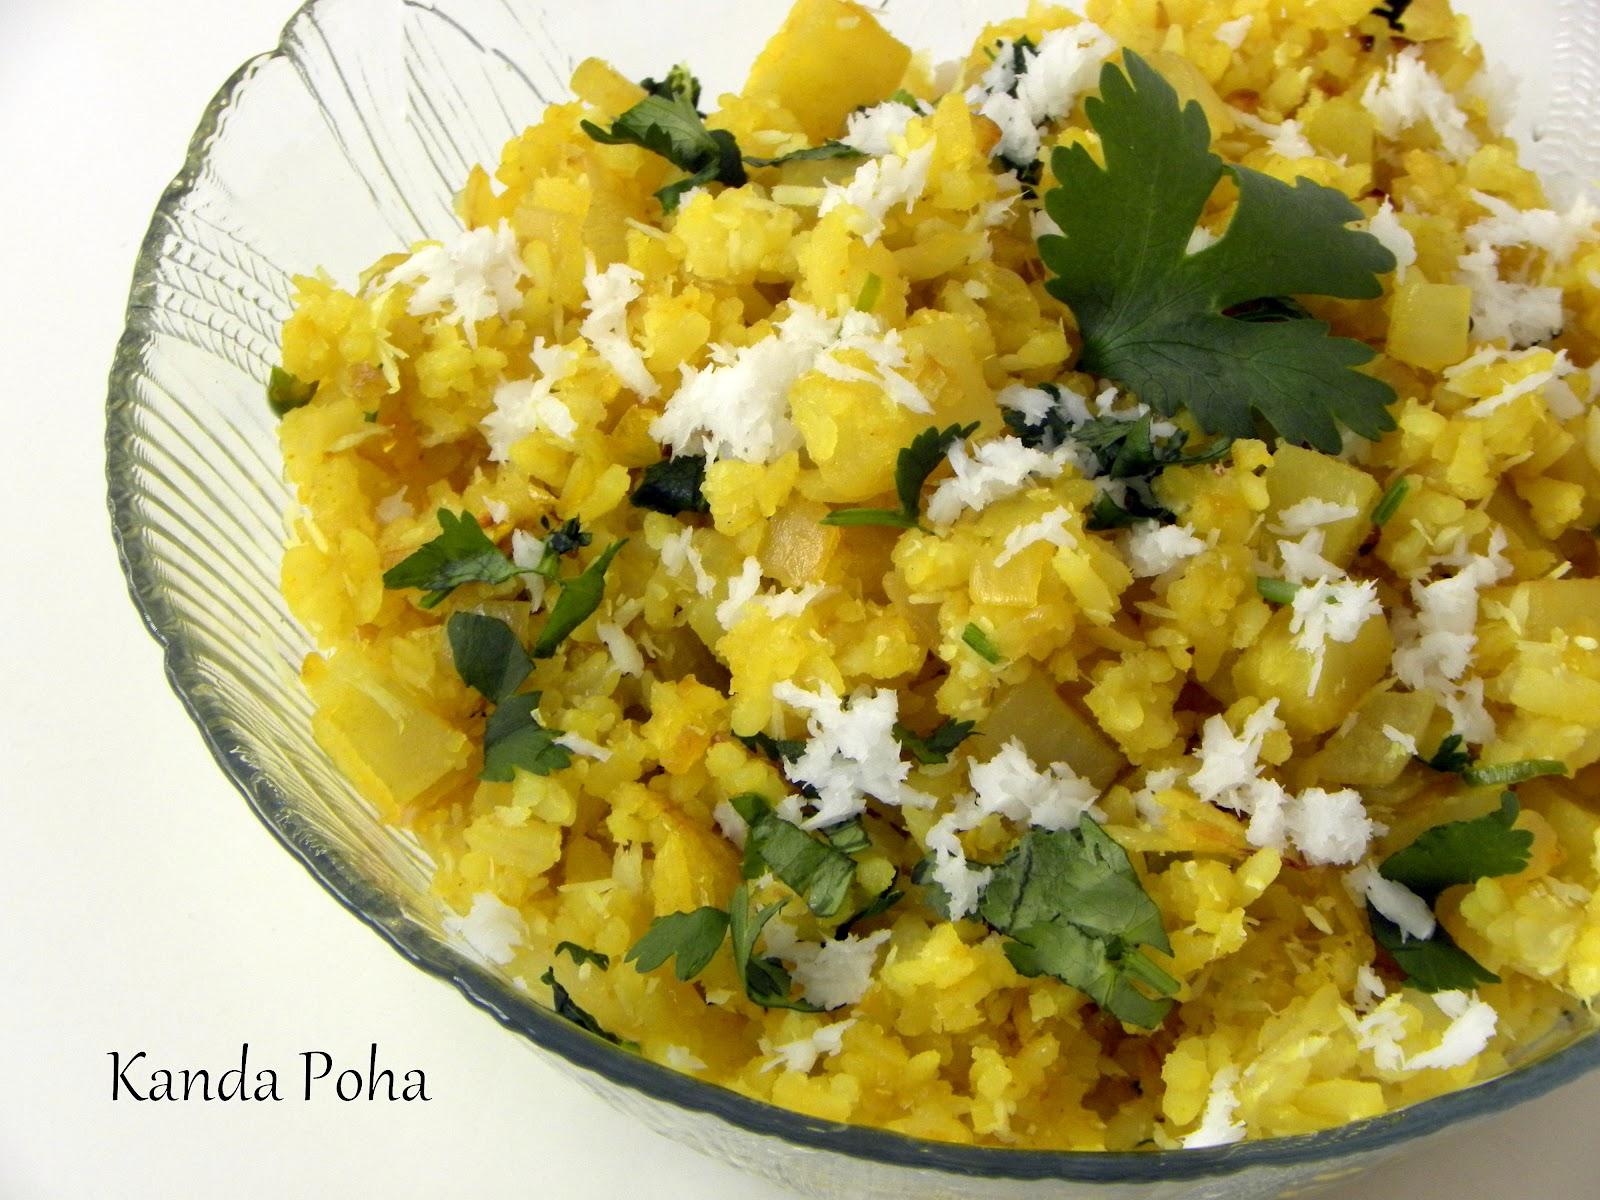 Kanda Poha Kande Poha Recipe How To Make Kanda Poha